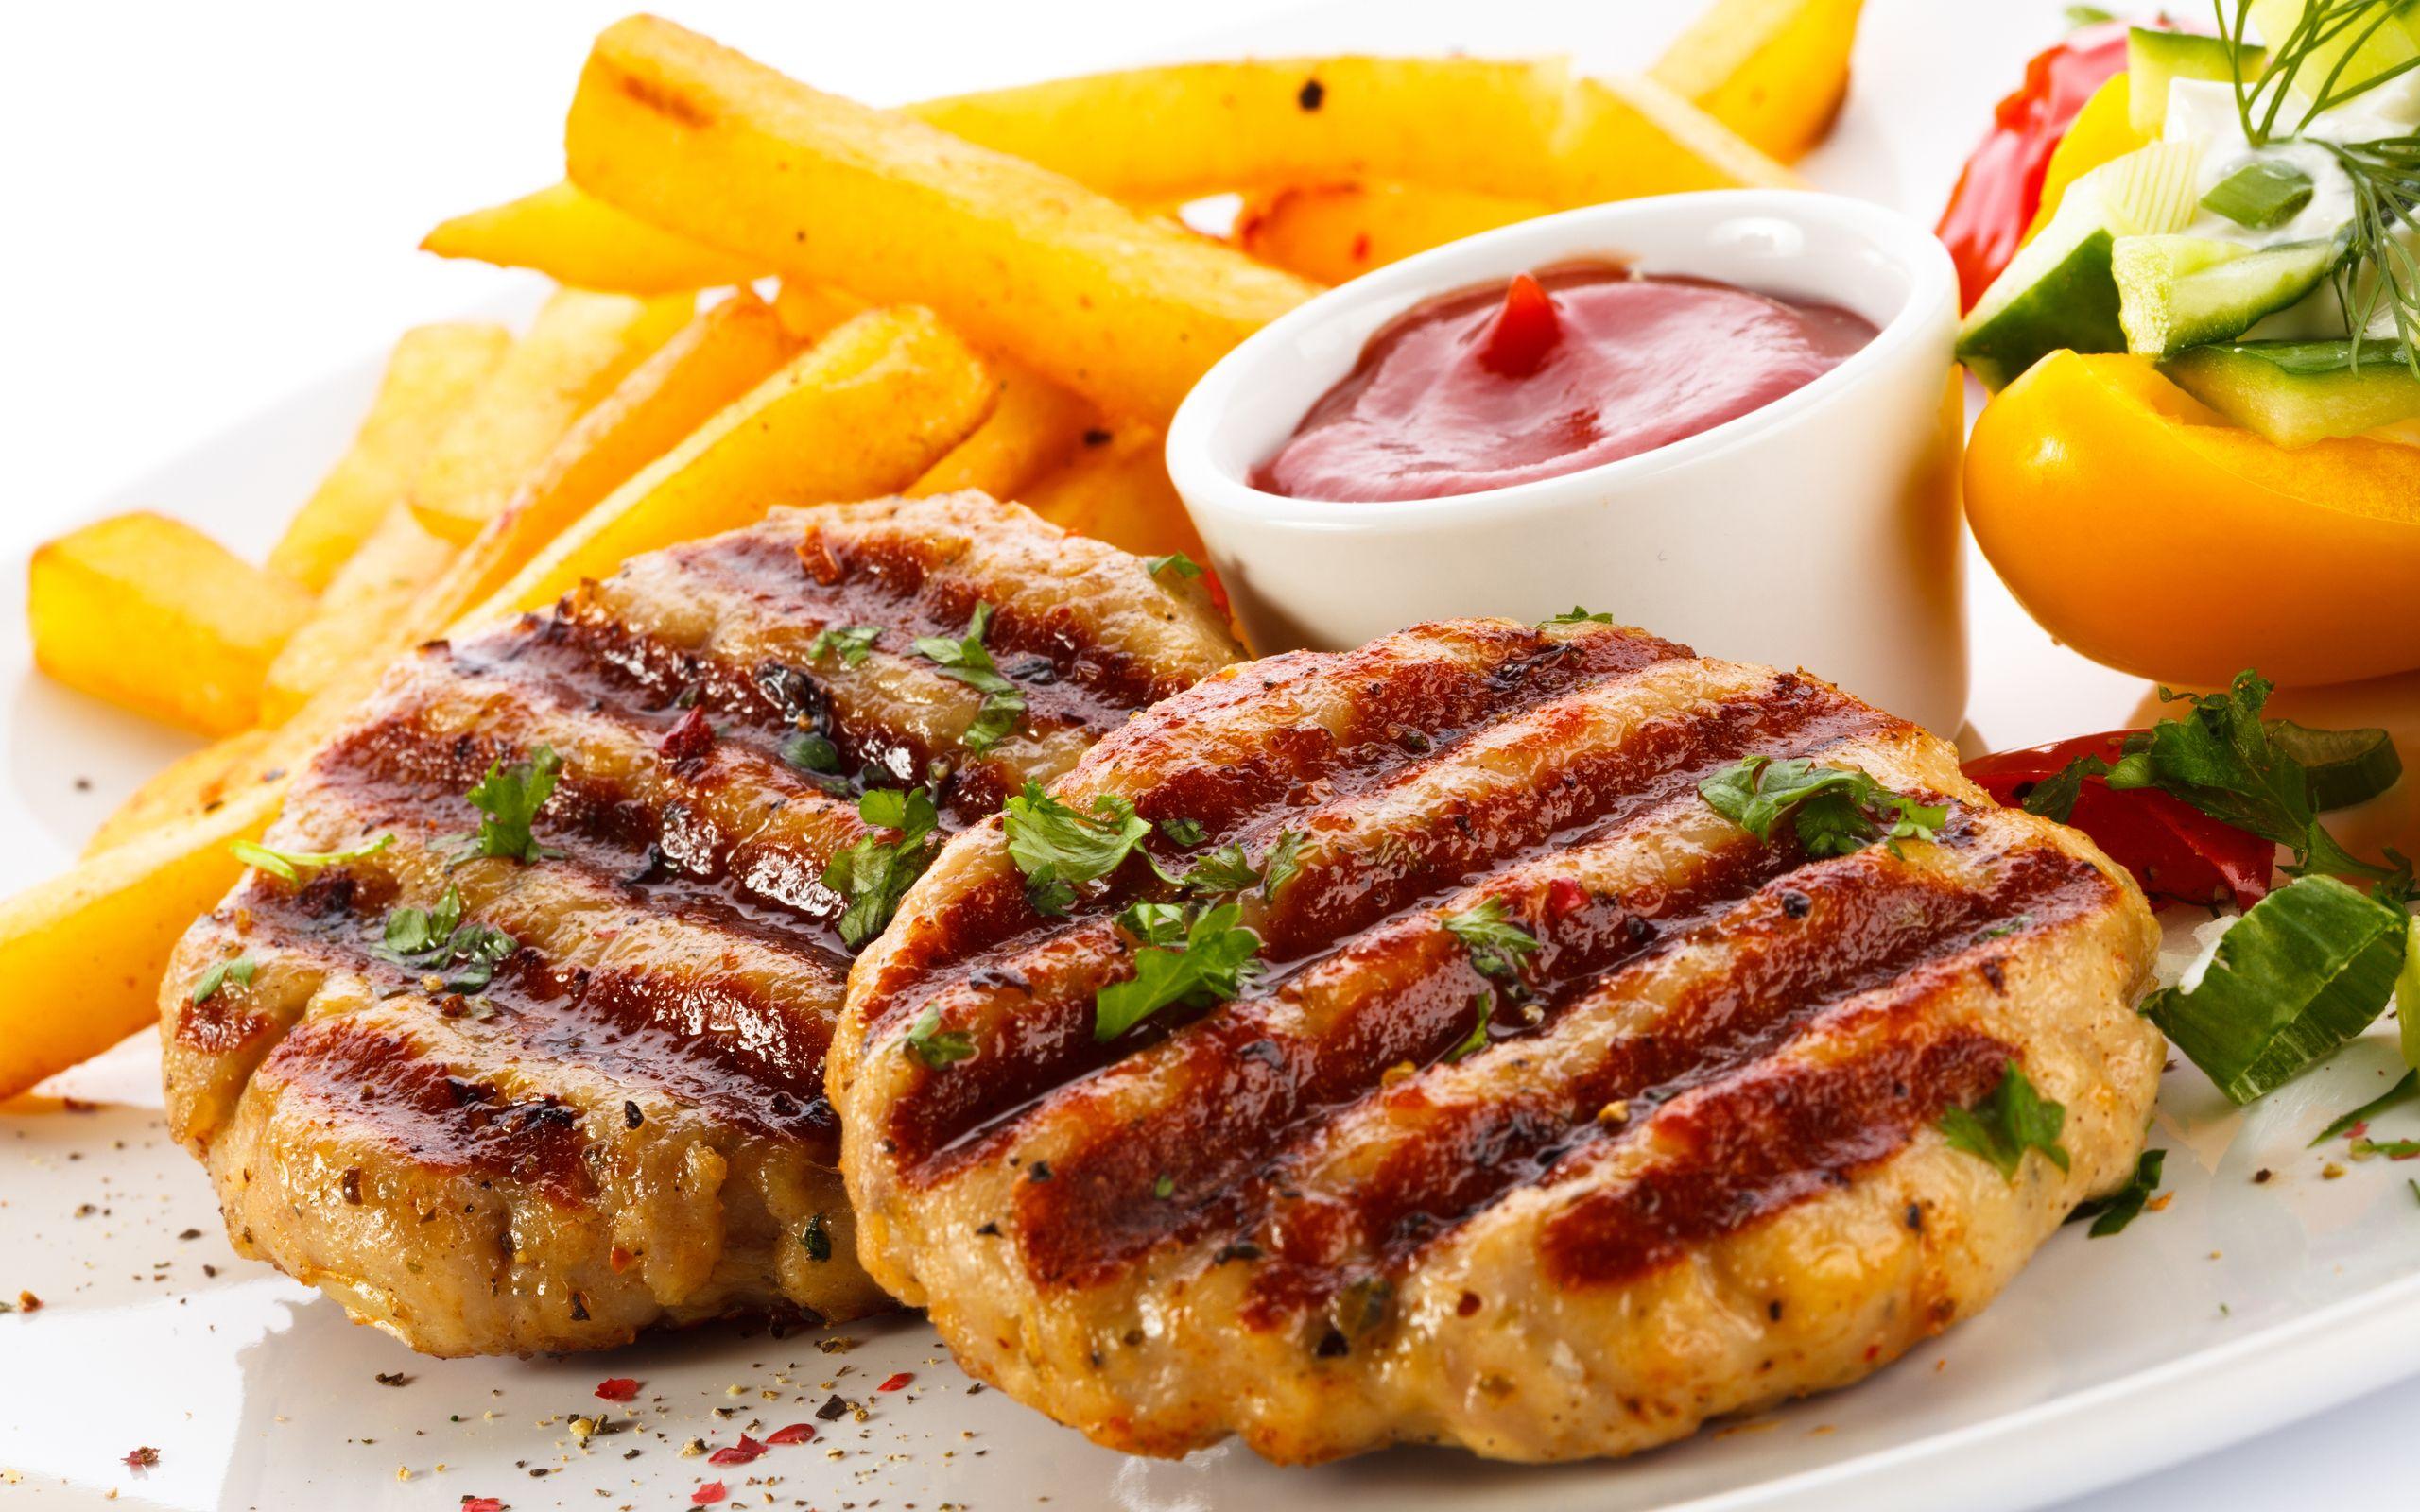 Johniammarinosandiego tasty and delicious food food